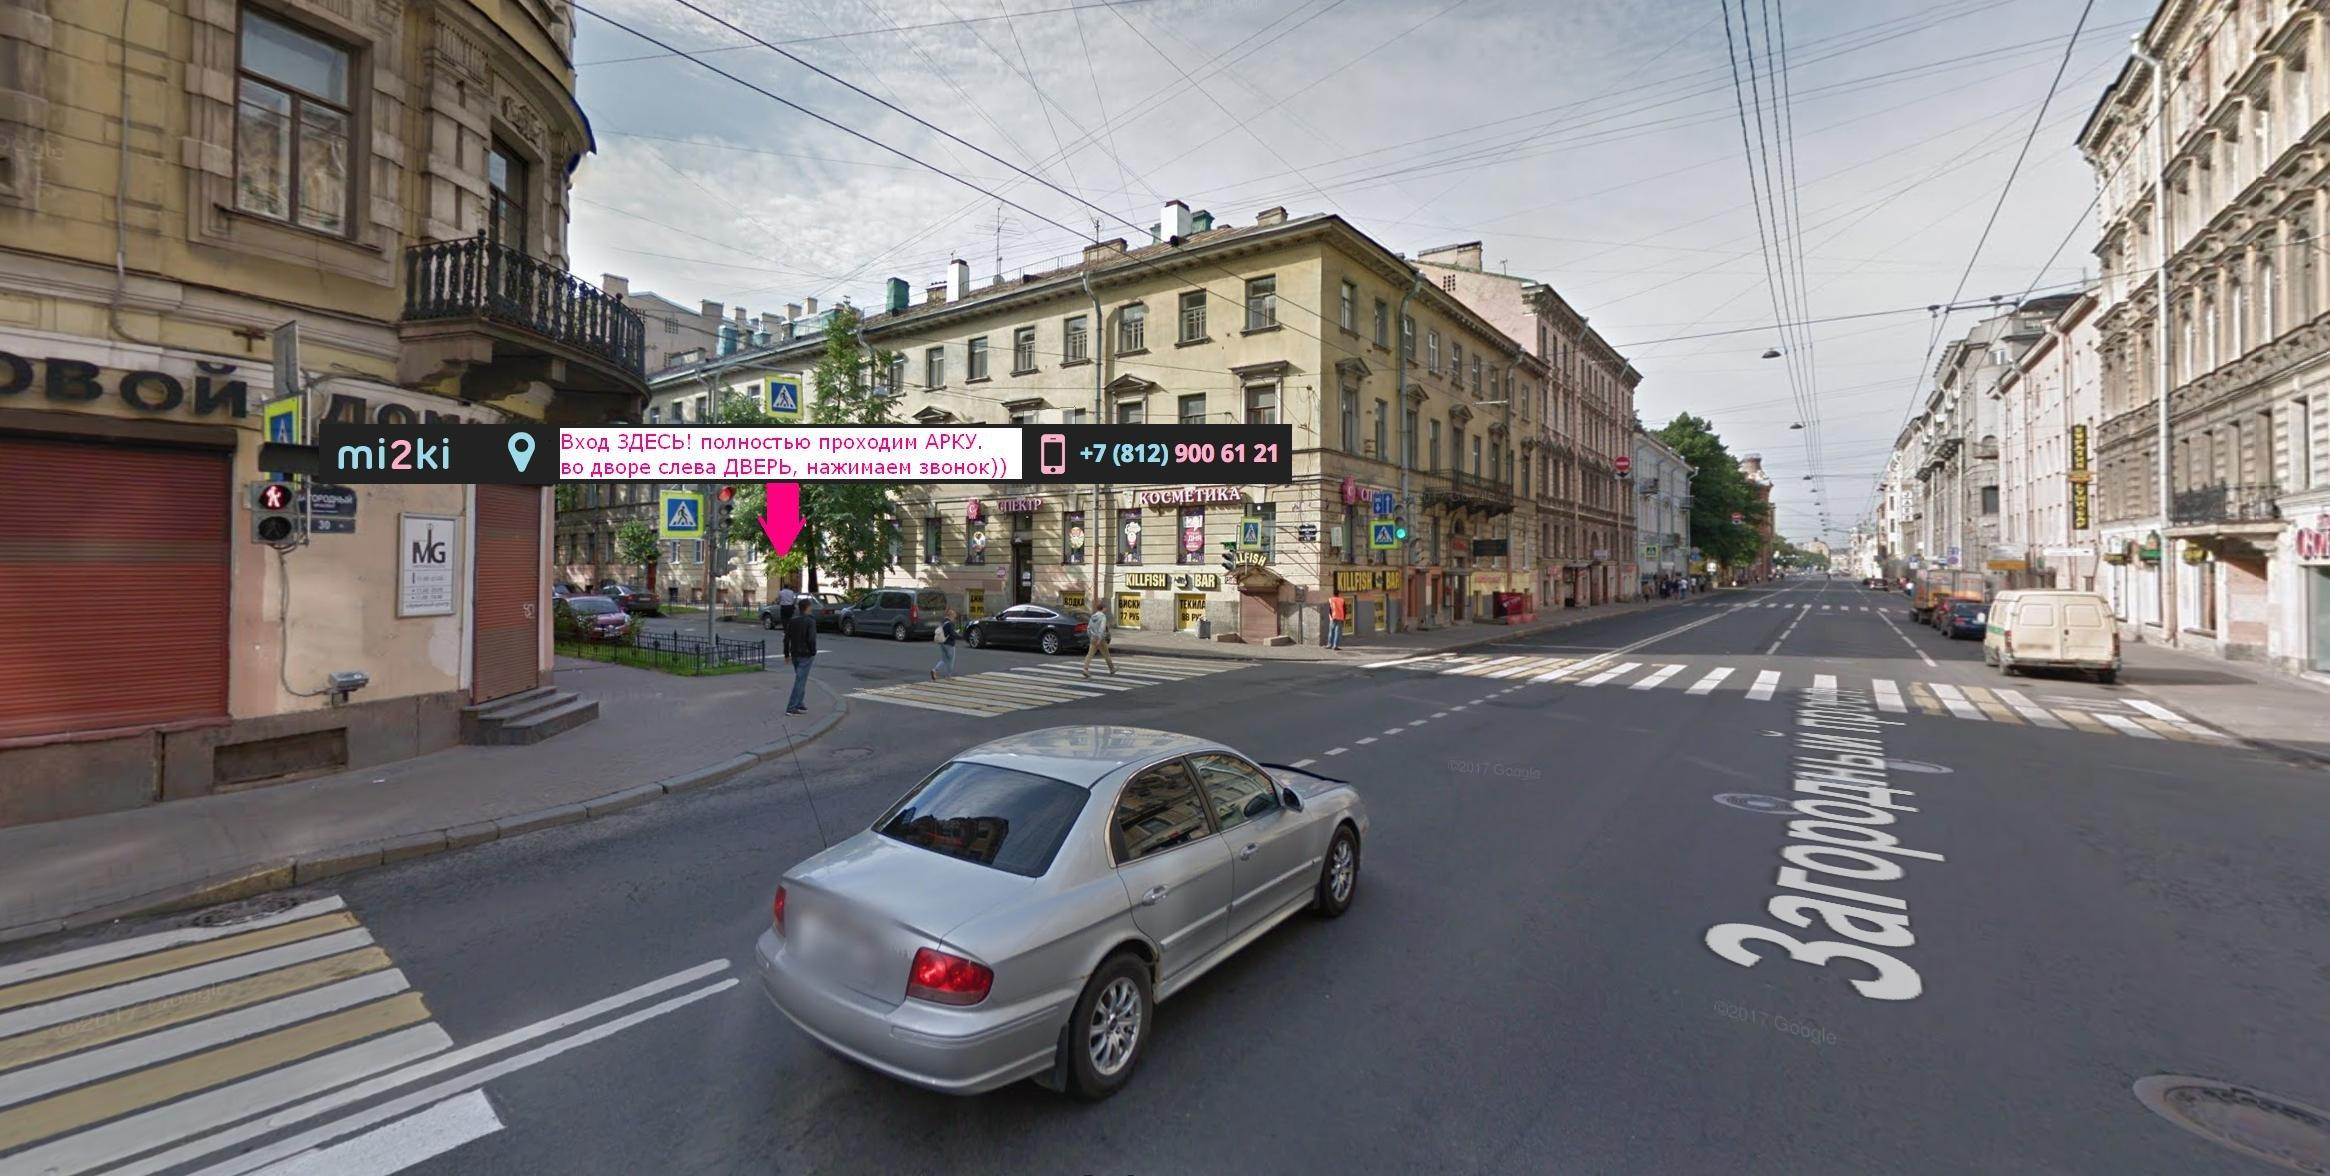 фотография Сервисного центра mi2ki на Социалистической улице